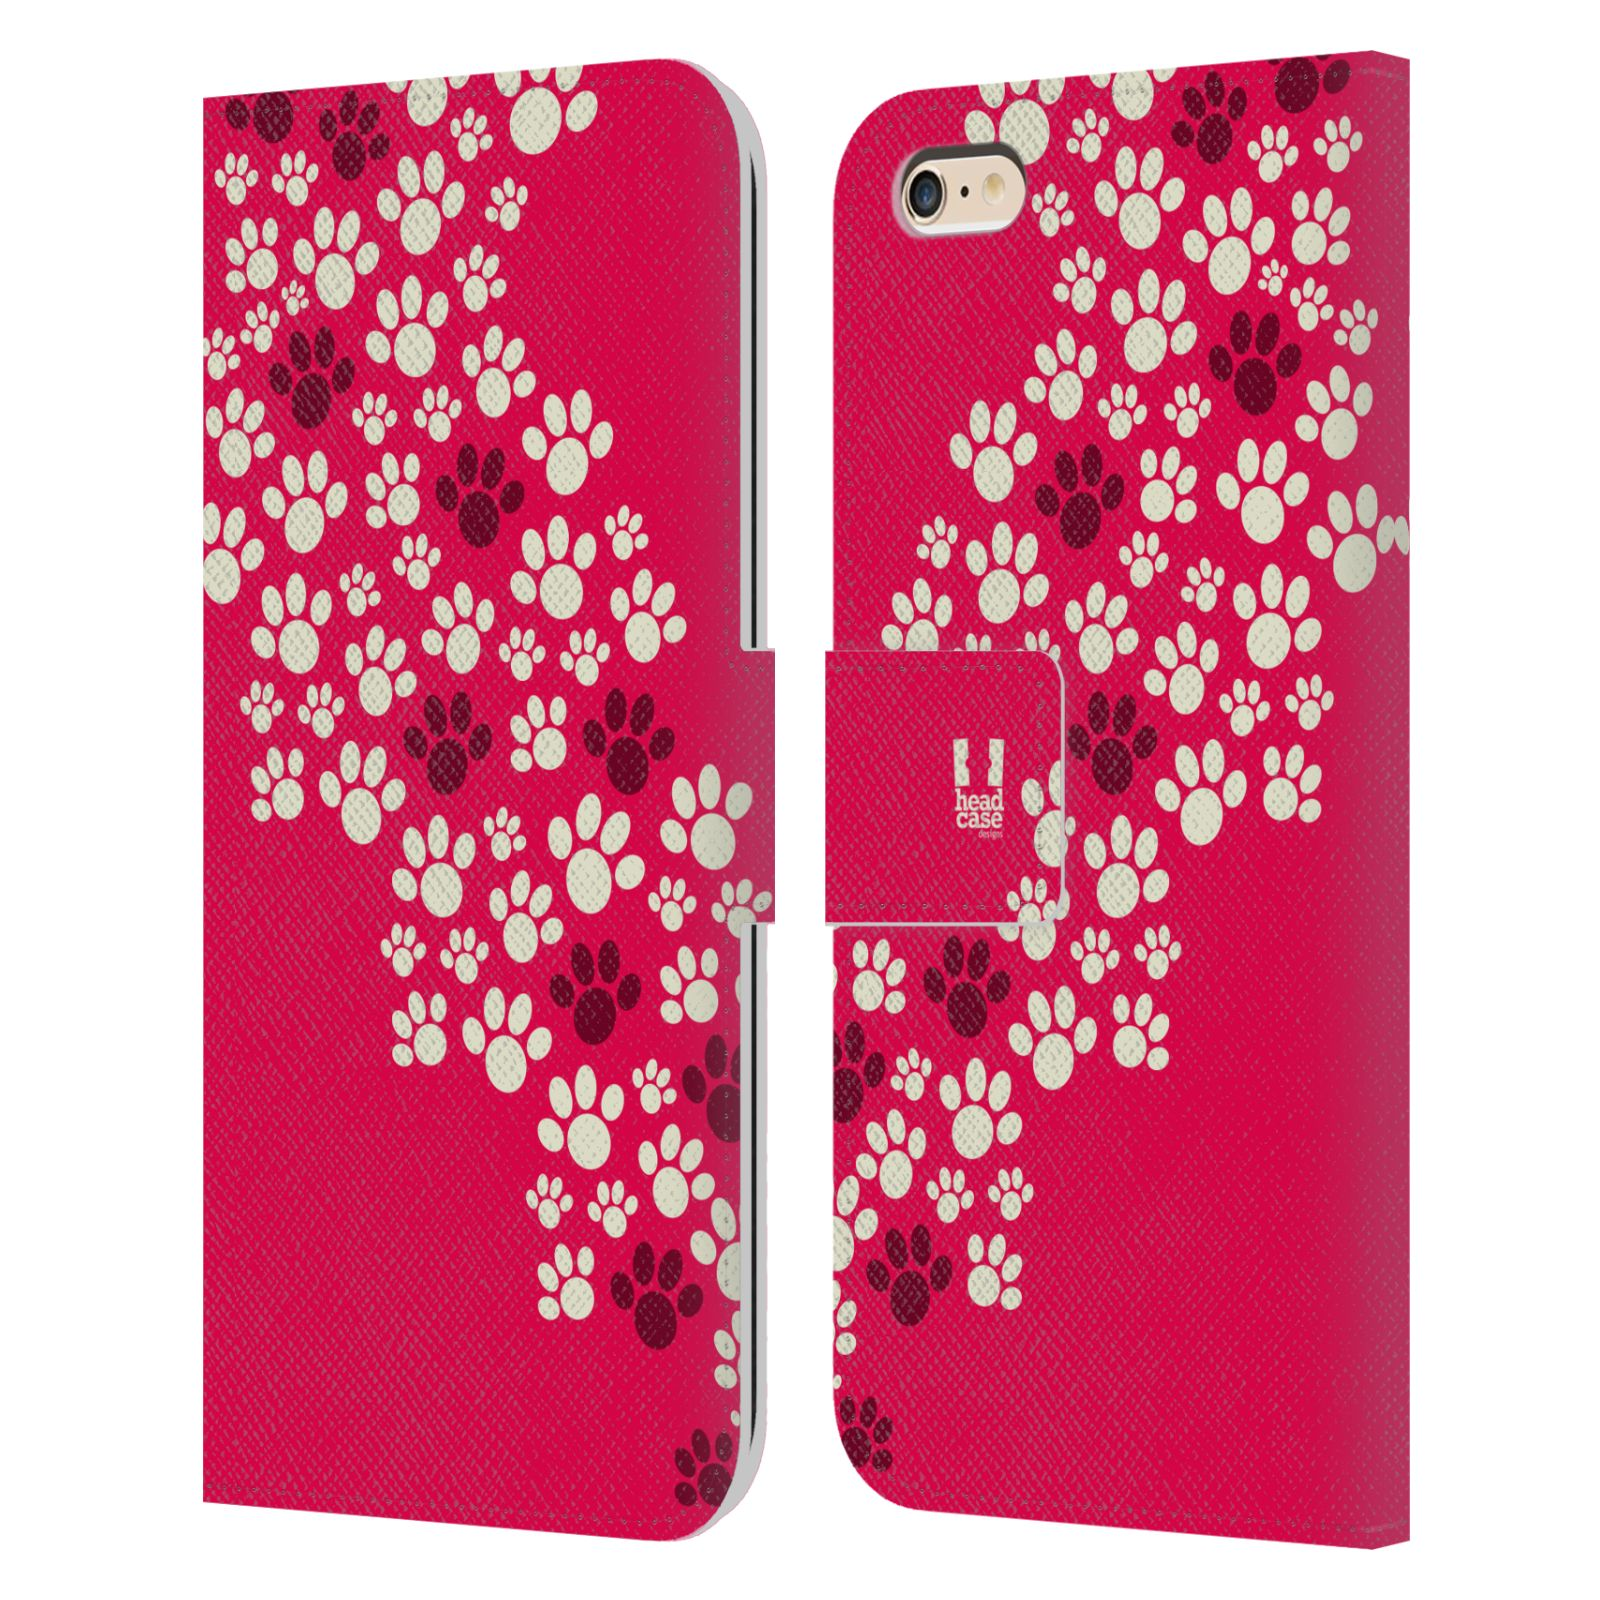 HEAD CASE Flipové pouzdro pro mobil Apple Iphone 6 PLUS / 6S PLUS Pejsek ťapky růžová barva